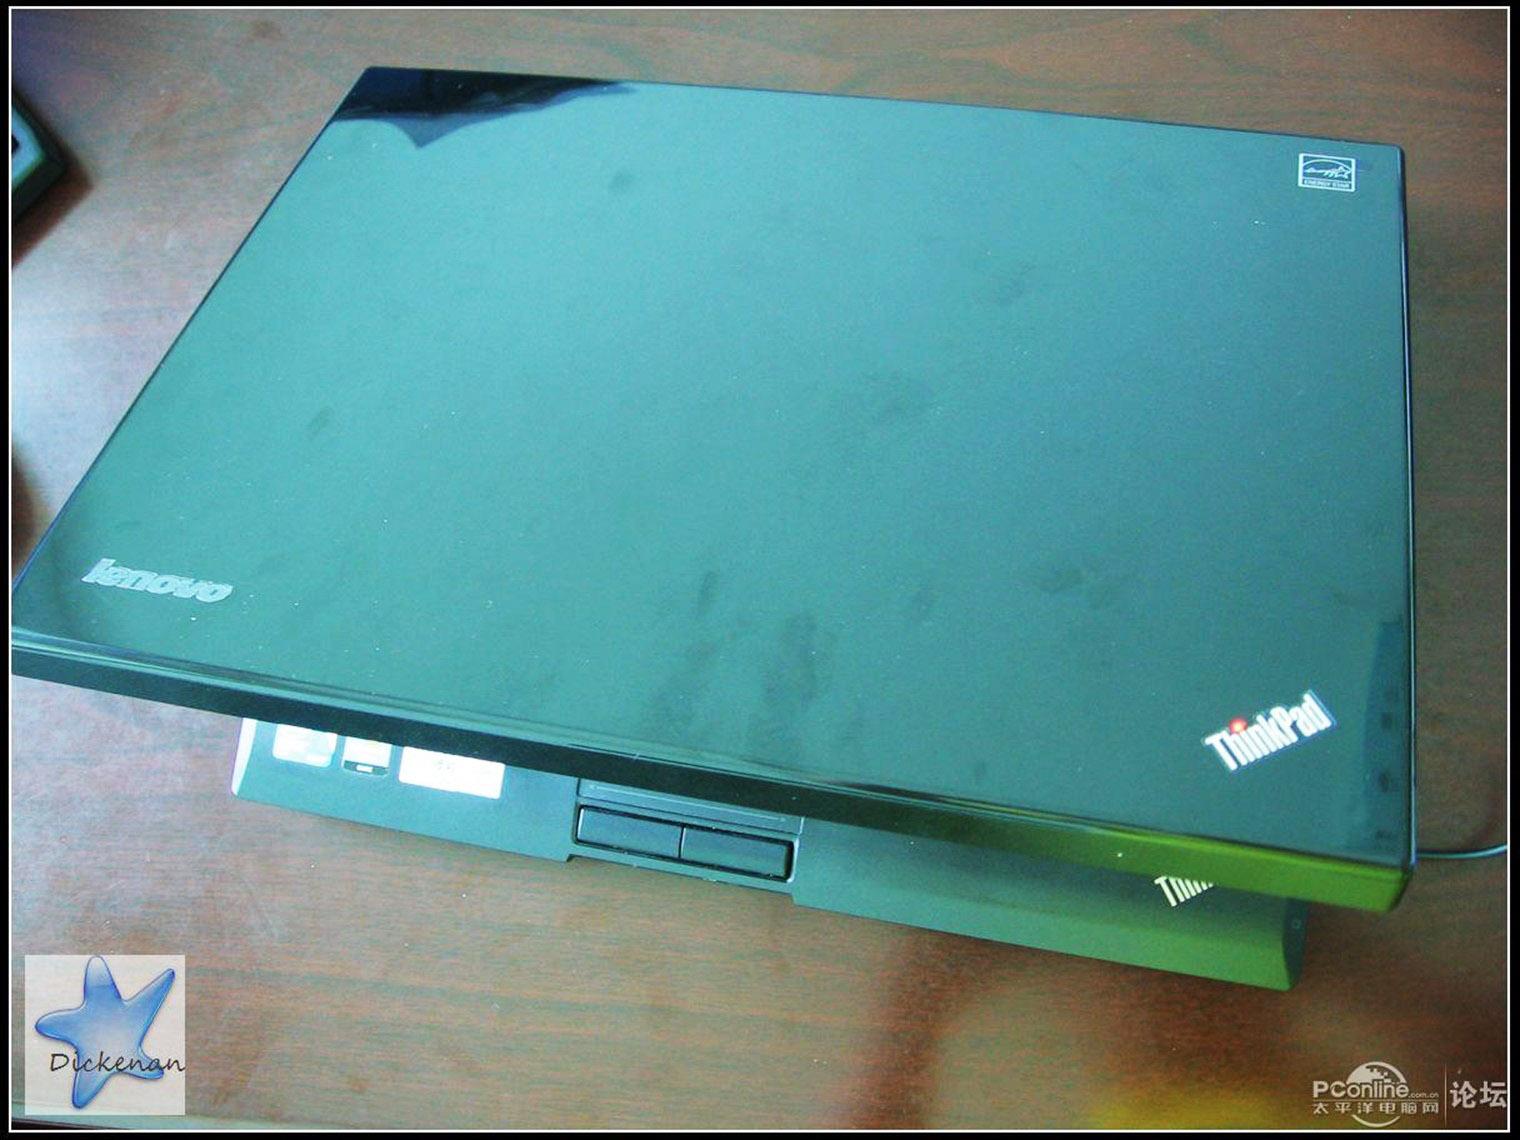 Lenovo ThinkPad SL400 Fan Cleaning